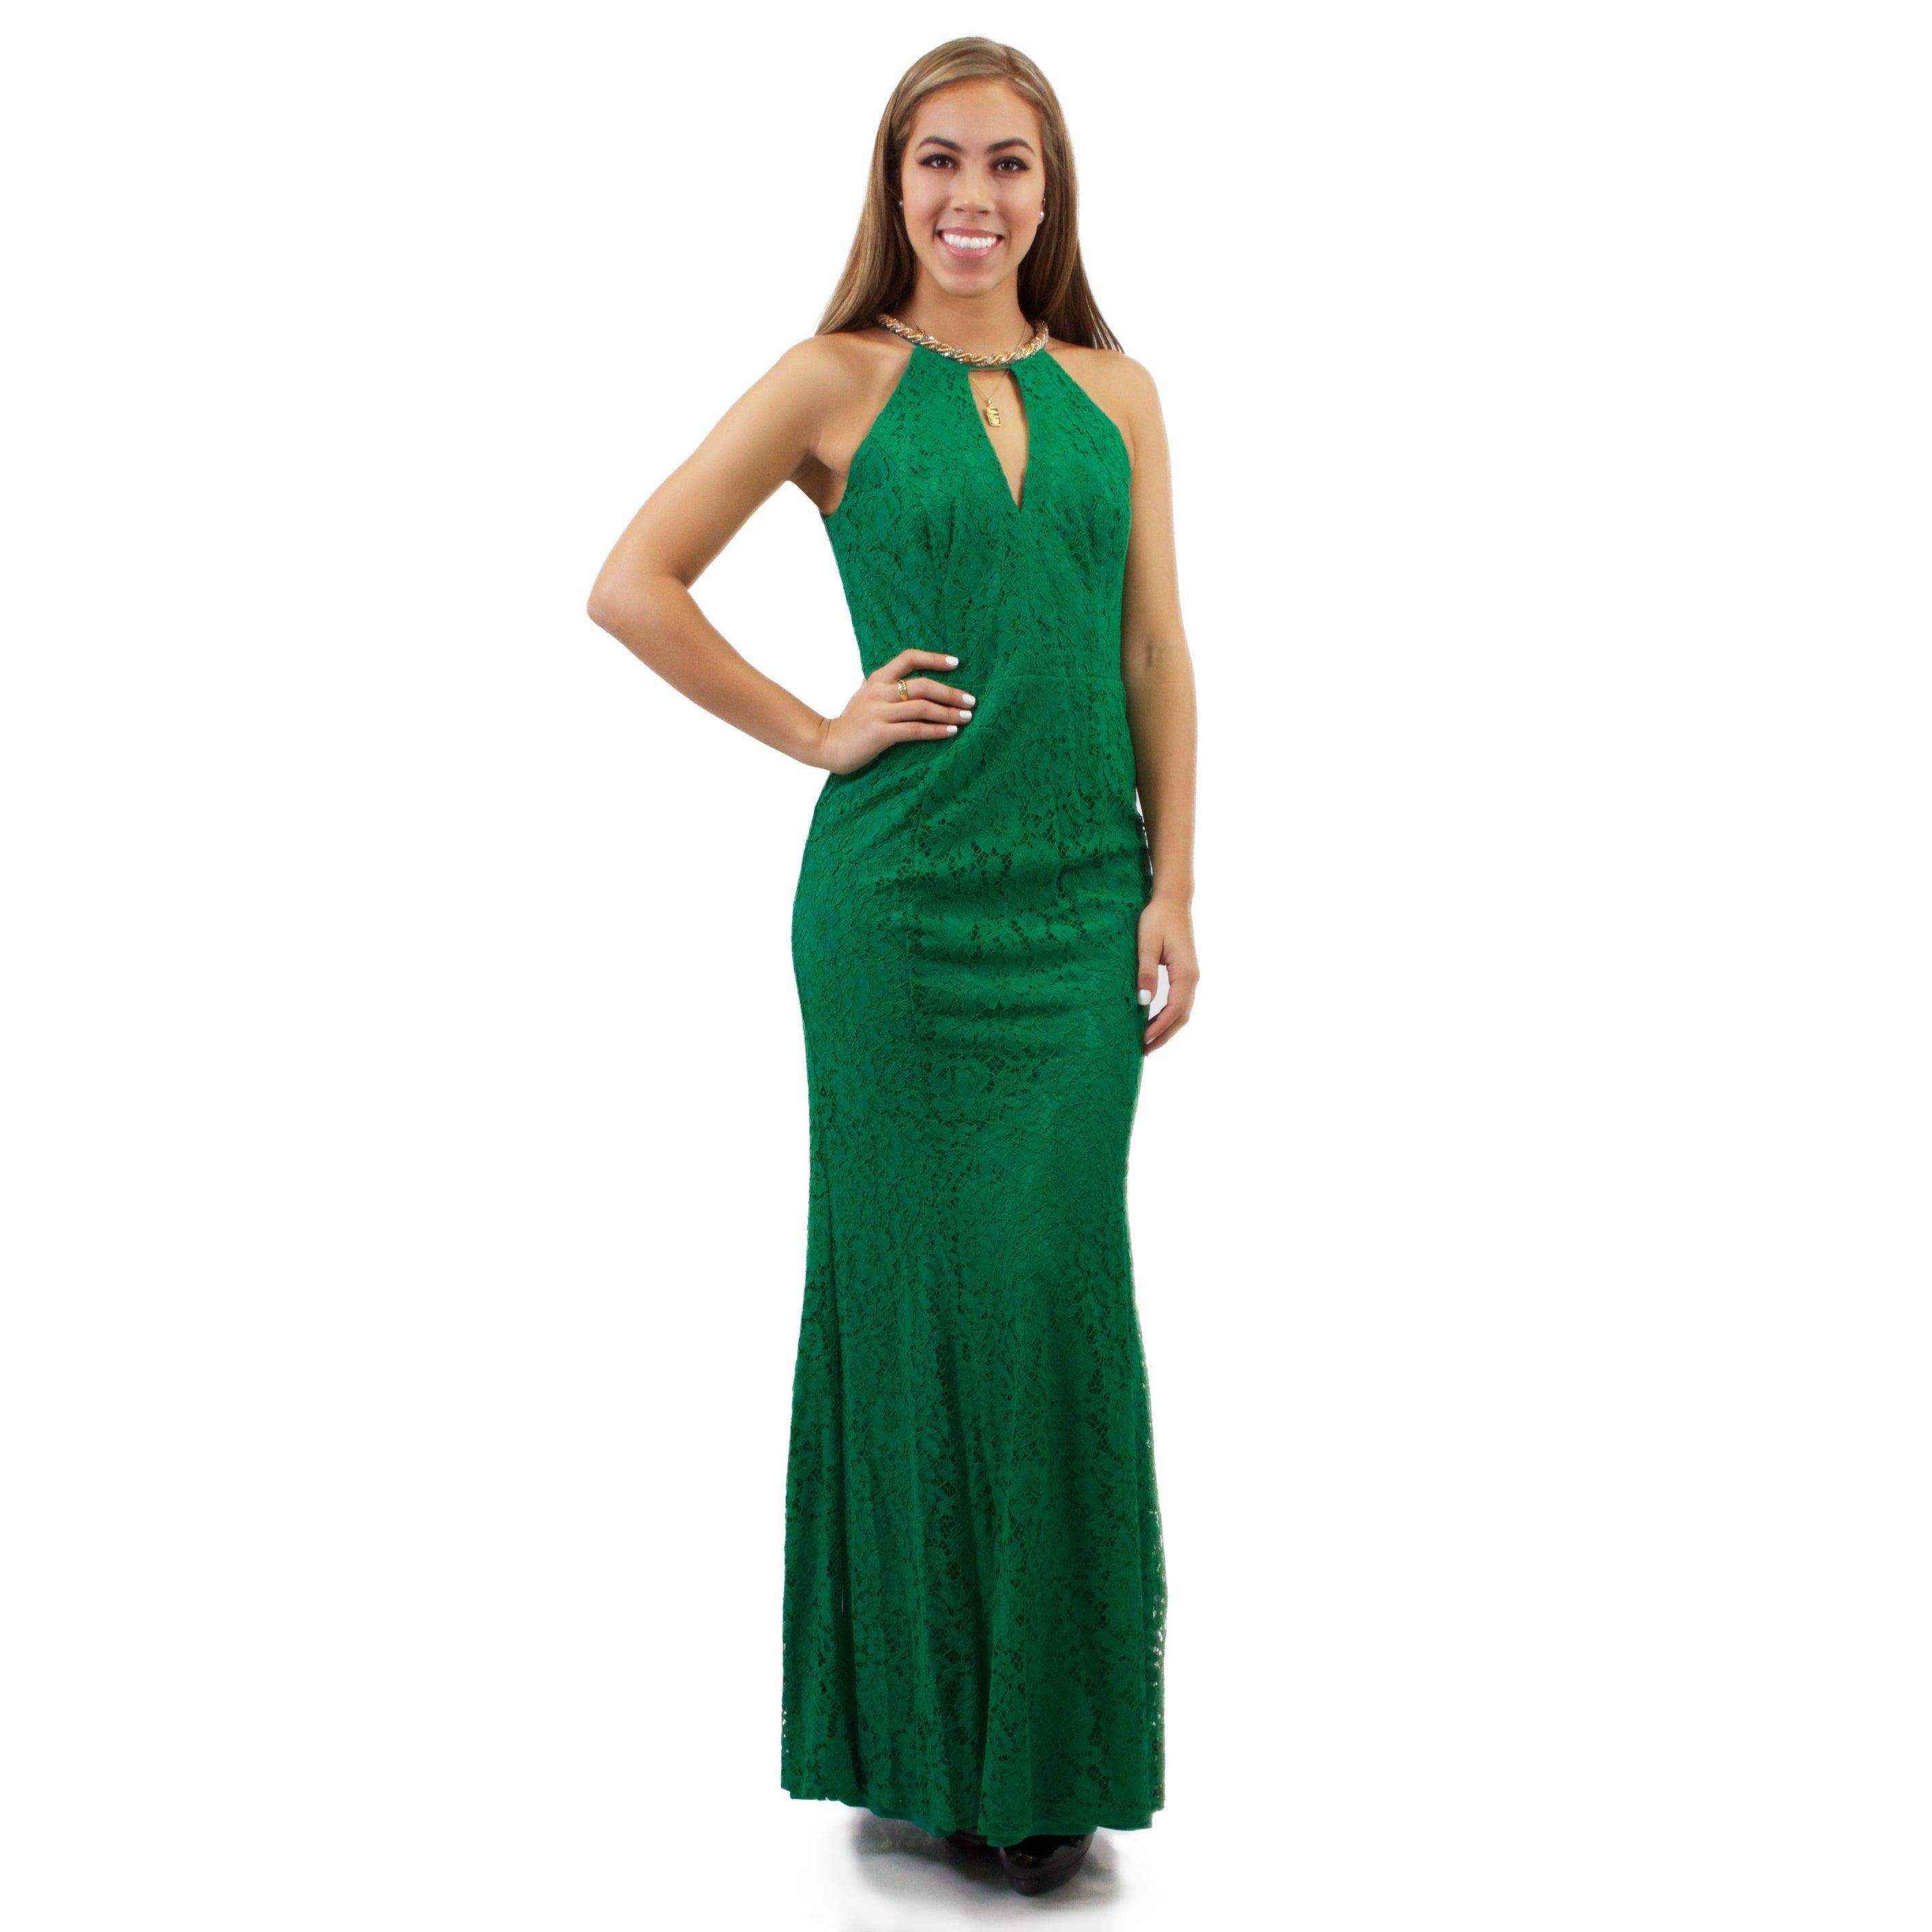 75b7d520fcb Estelles Dressy Dresses Coupon Code - Gomes Weine AG